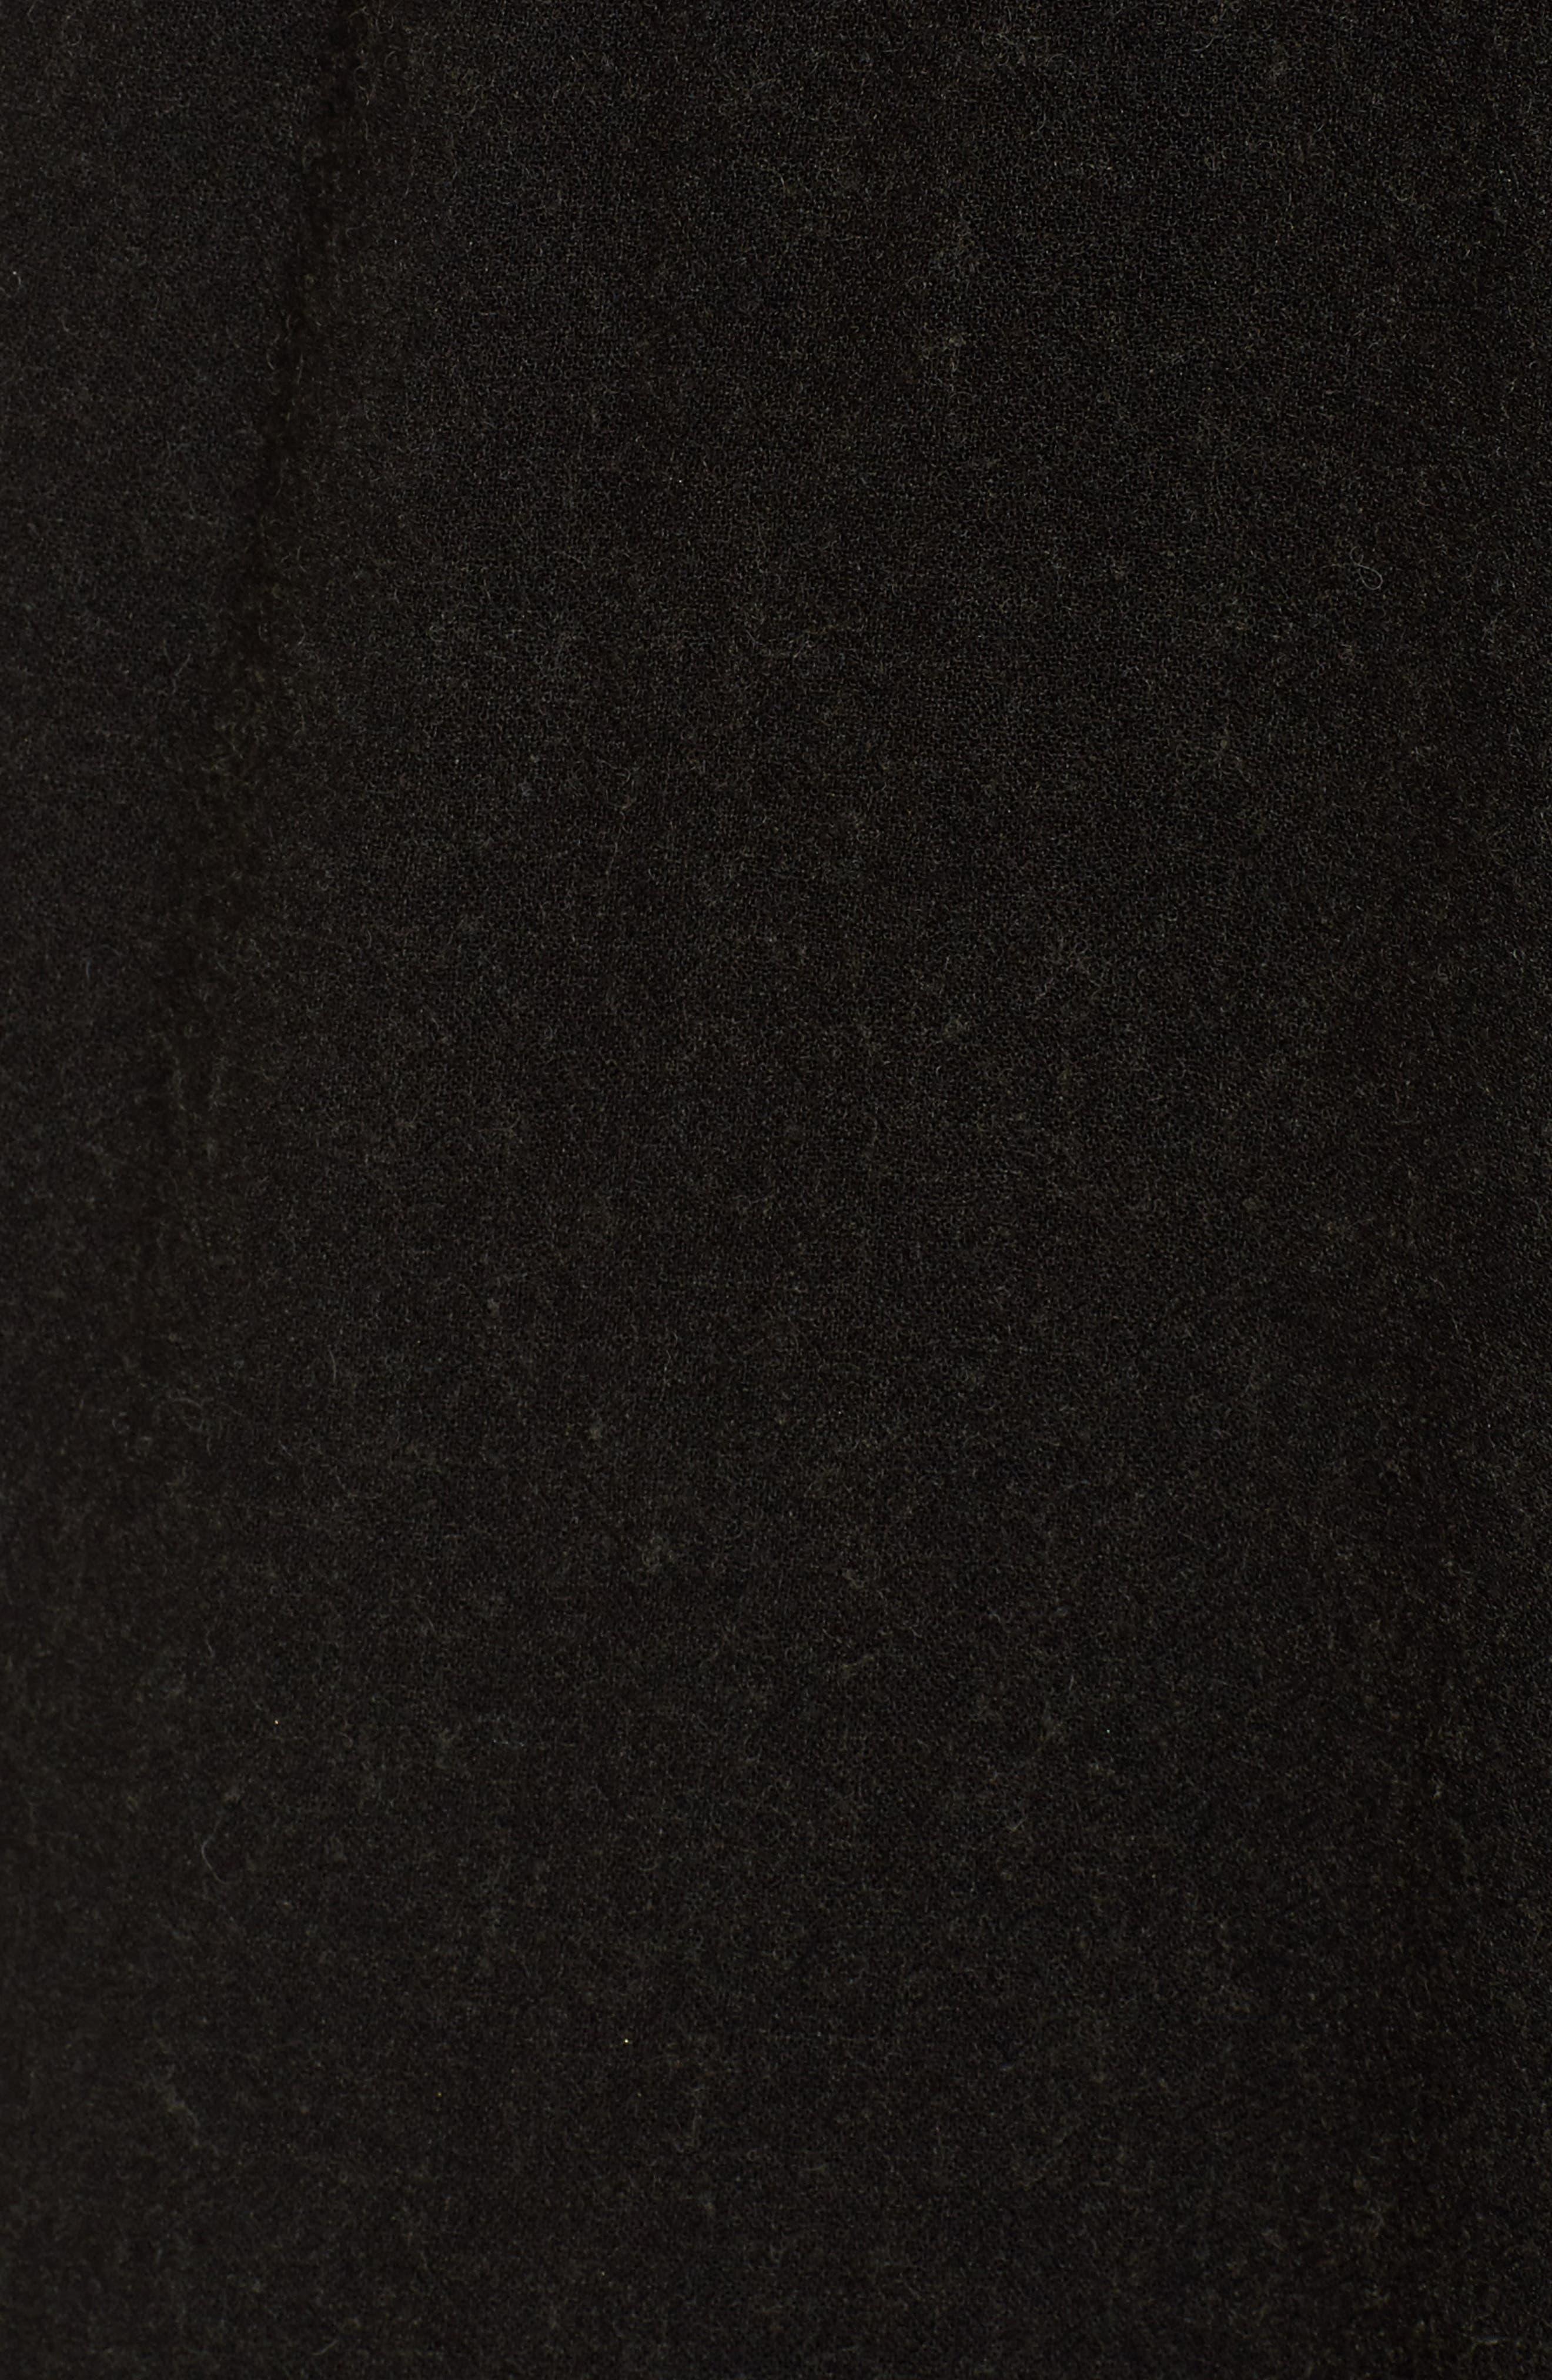 Midi Skirt,                             Alternate thumbnail 5, color,                             001